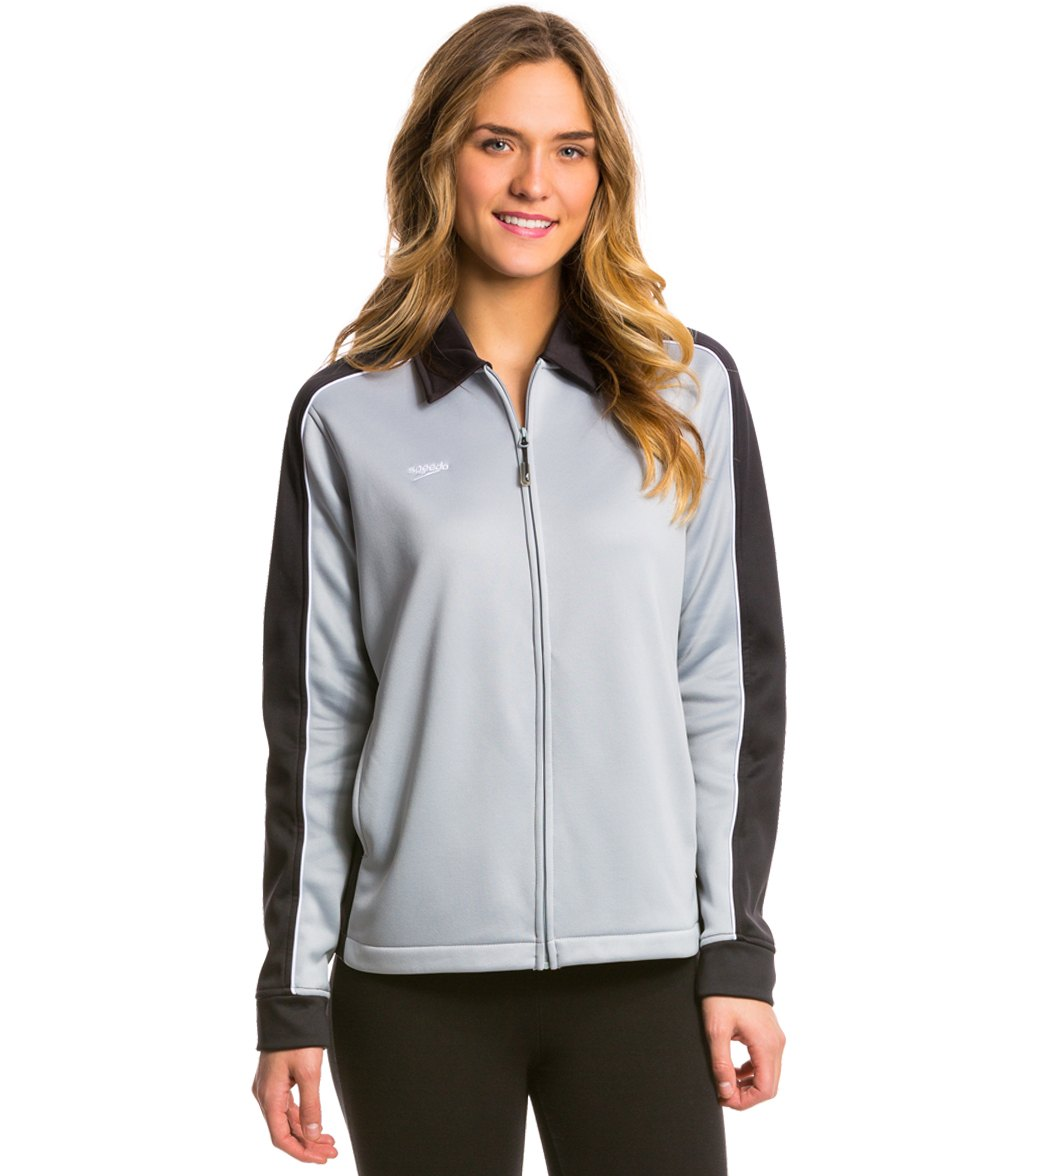 Speedo Womens Female Tech Warm Up Jacket